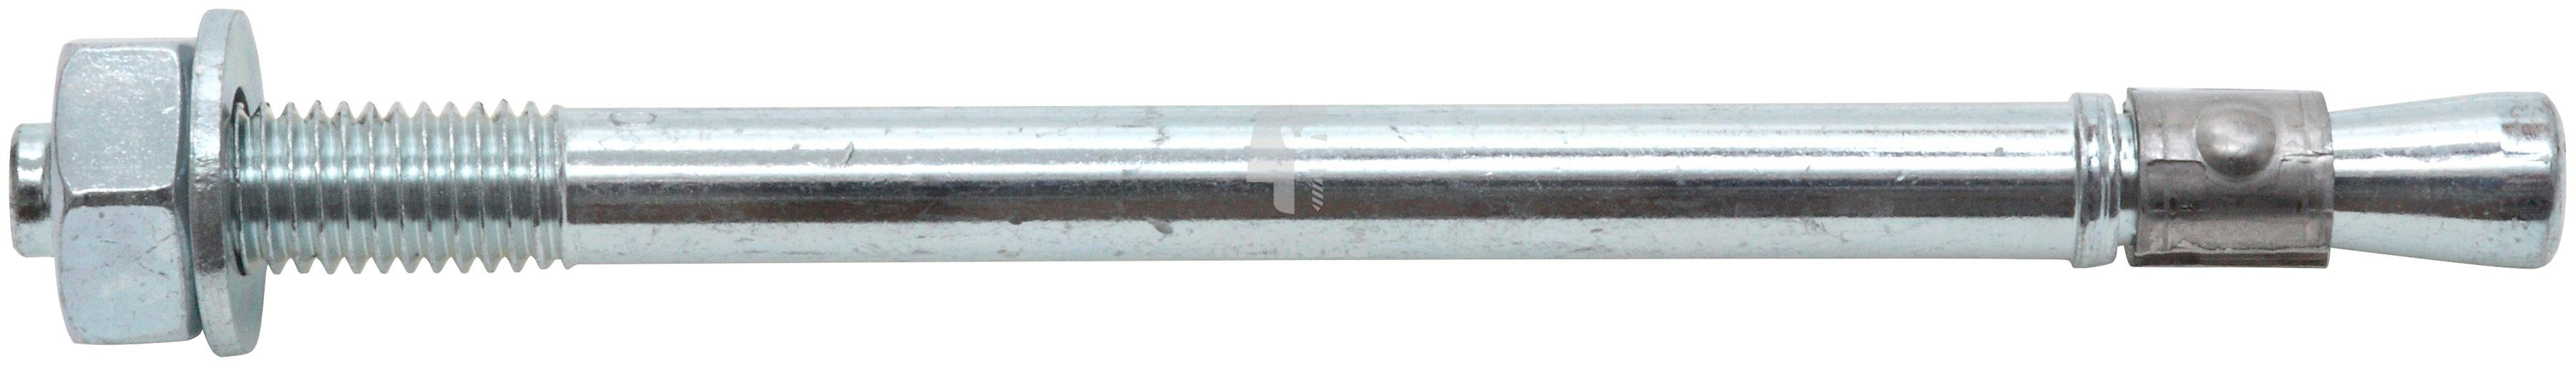 RAMSES Dübel , Bolzenanker B M16 x 150 mm, 10 Stück